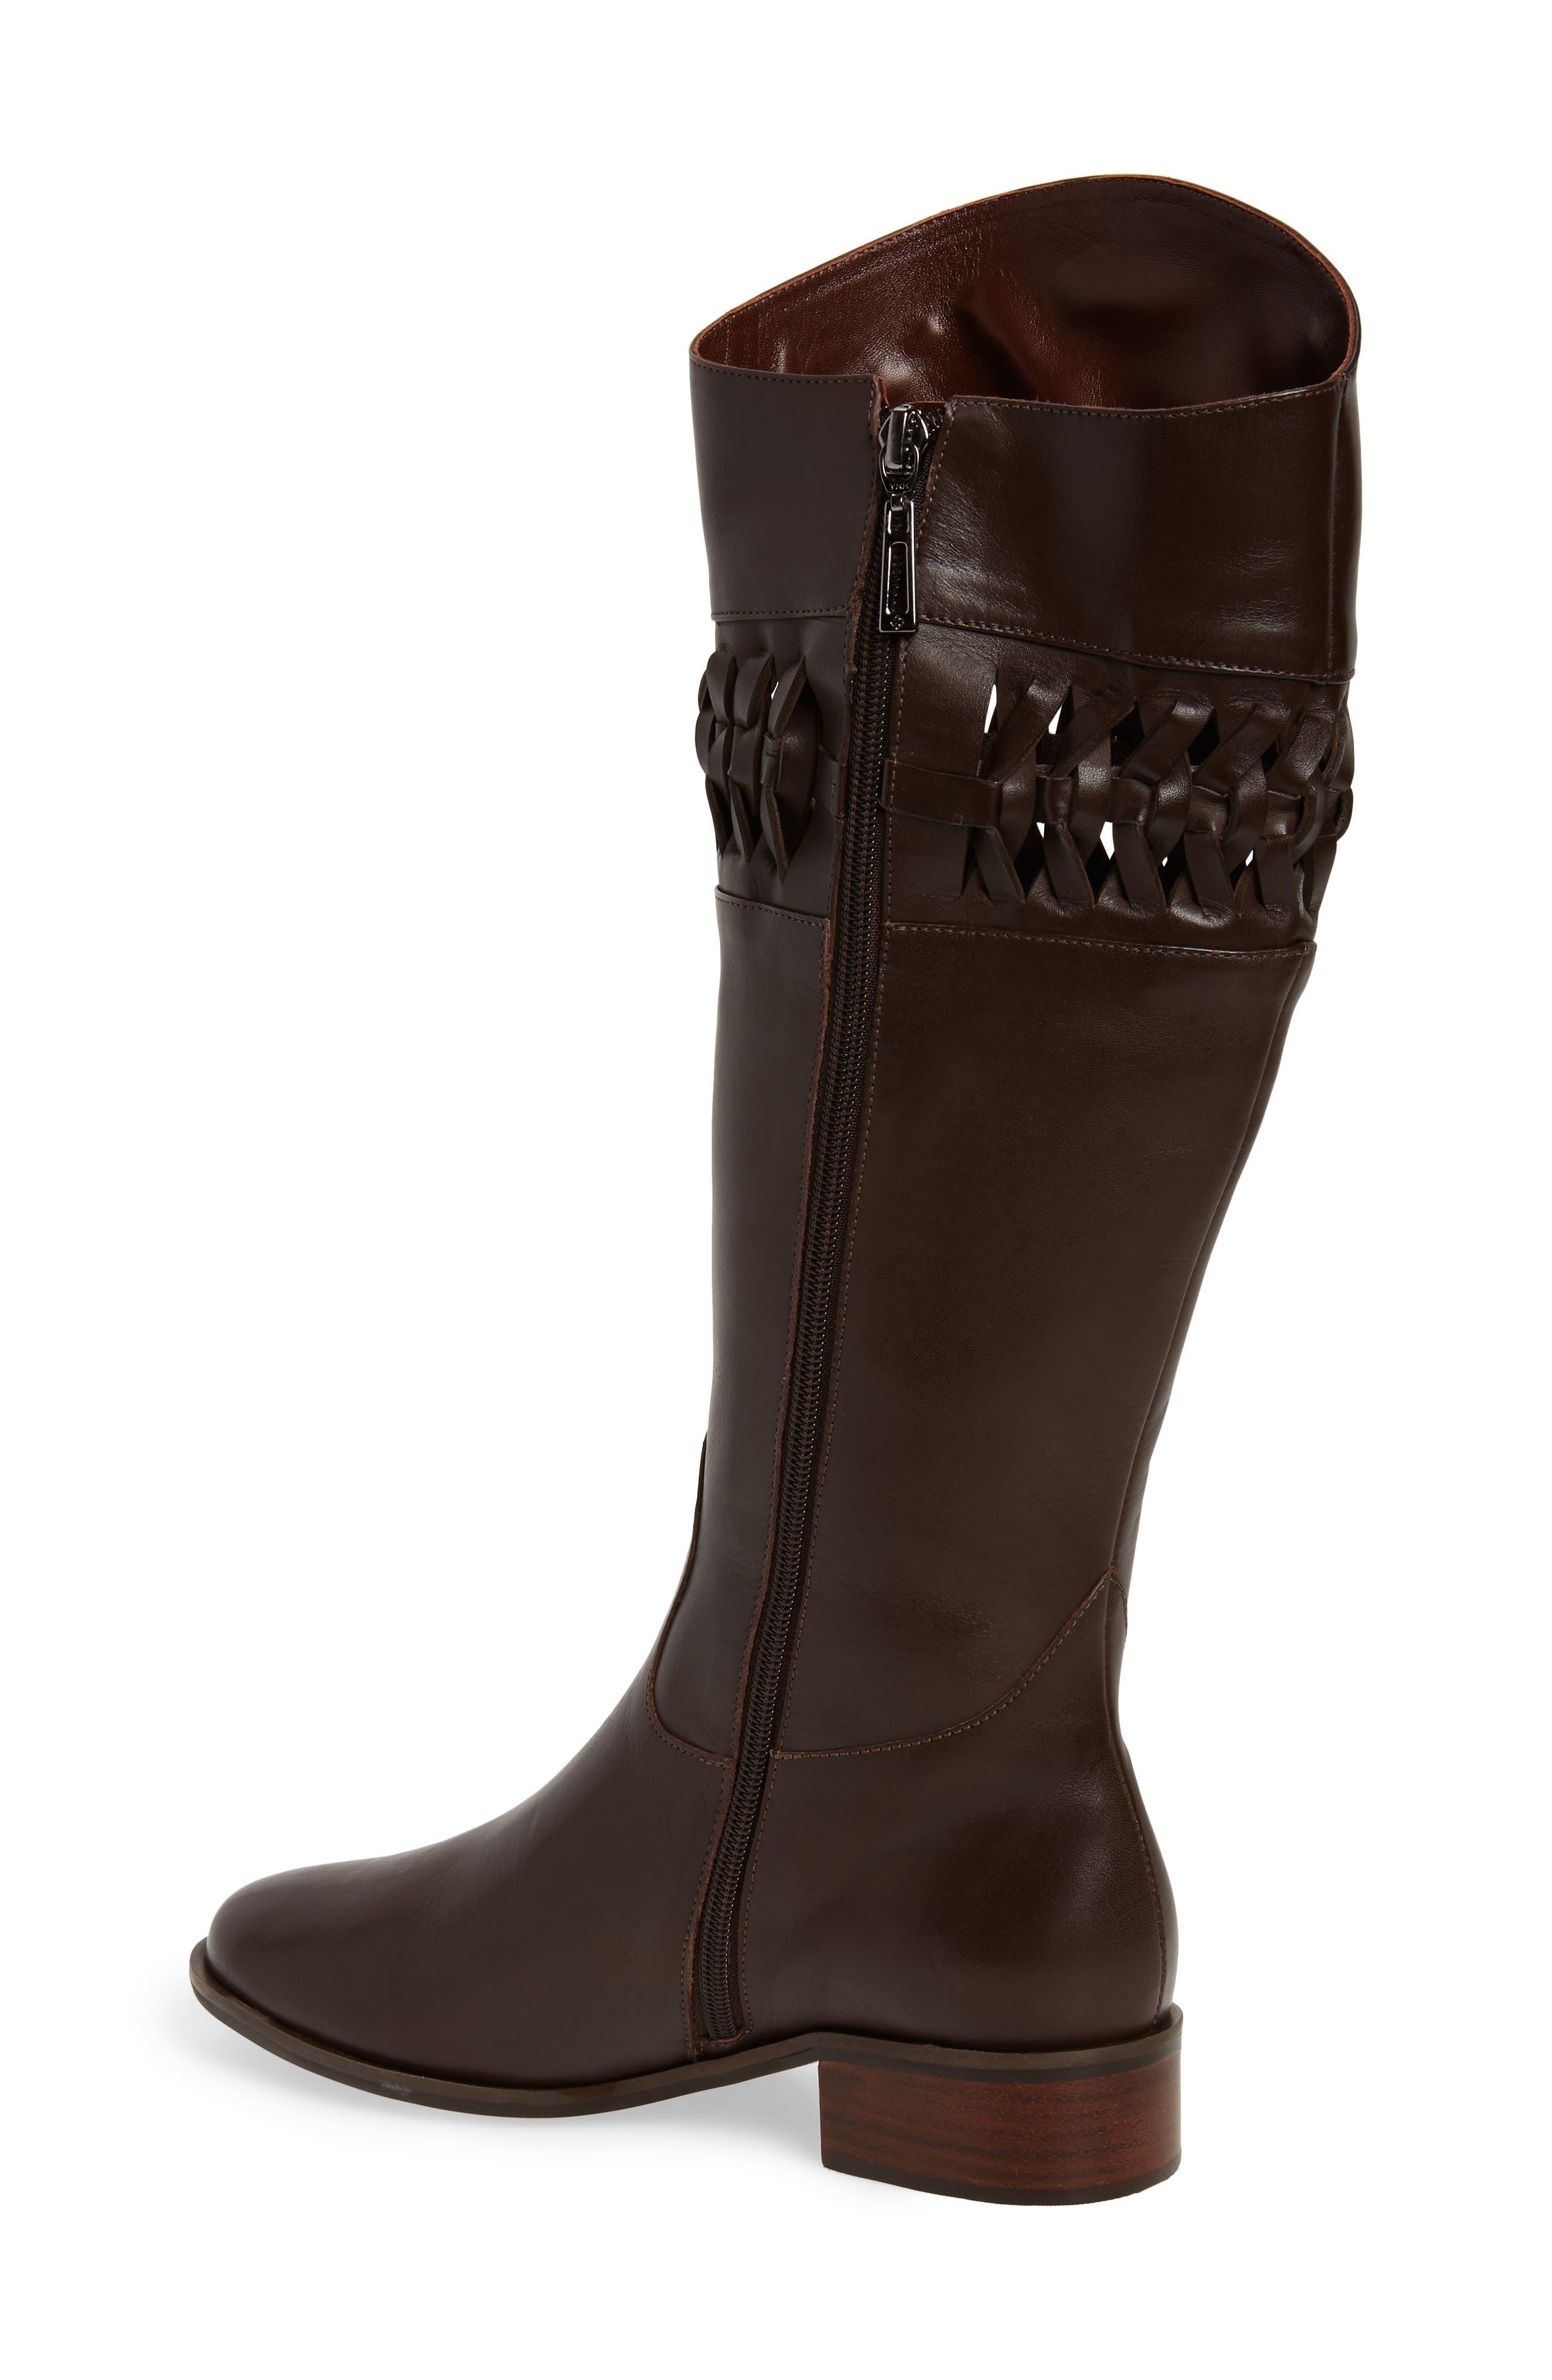 Zezette Woven Boot,                             Alternate thumbnail 2, color,                             Cafe Leather